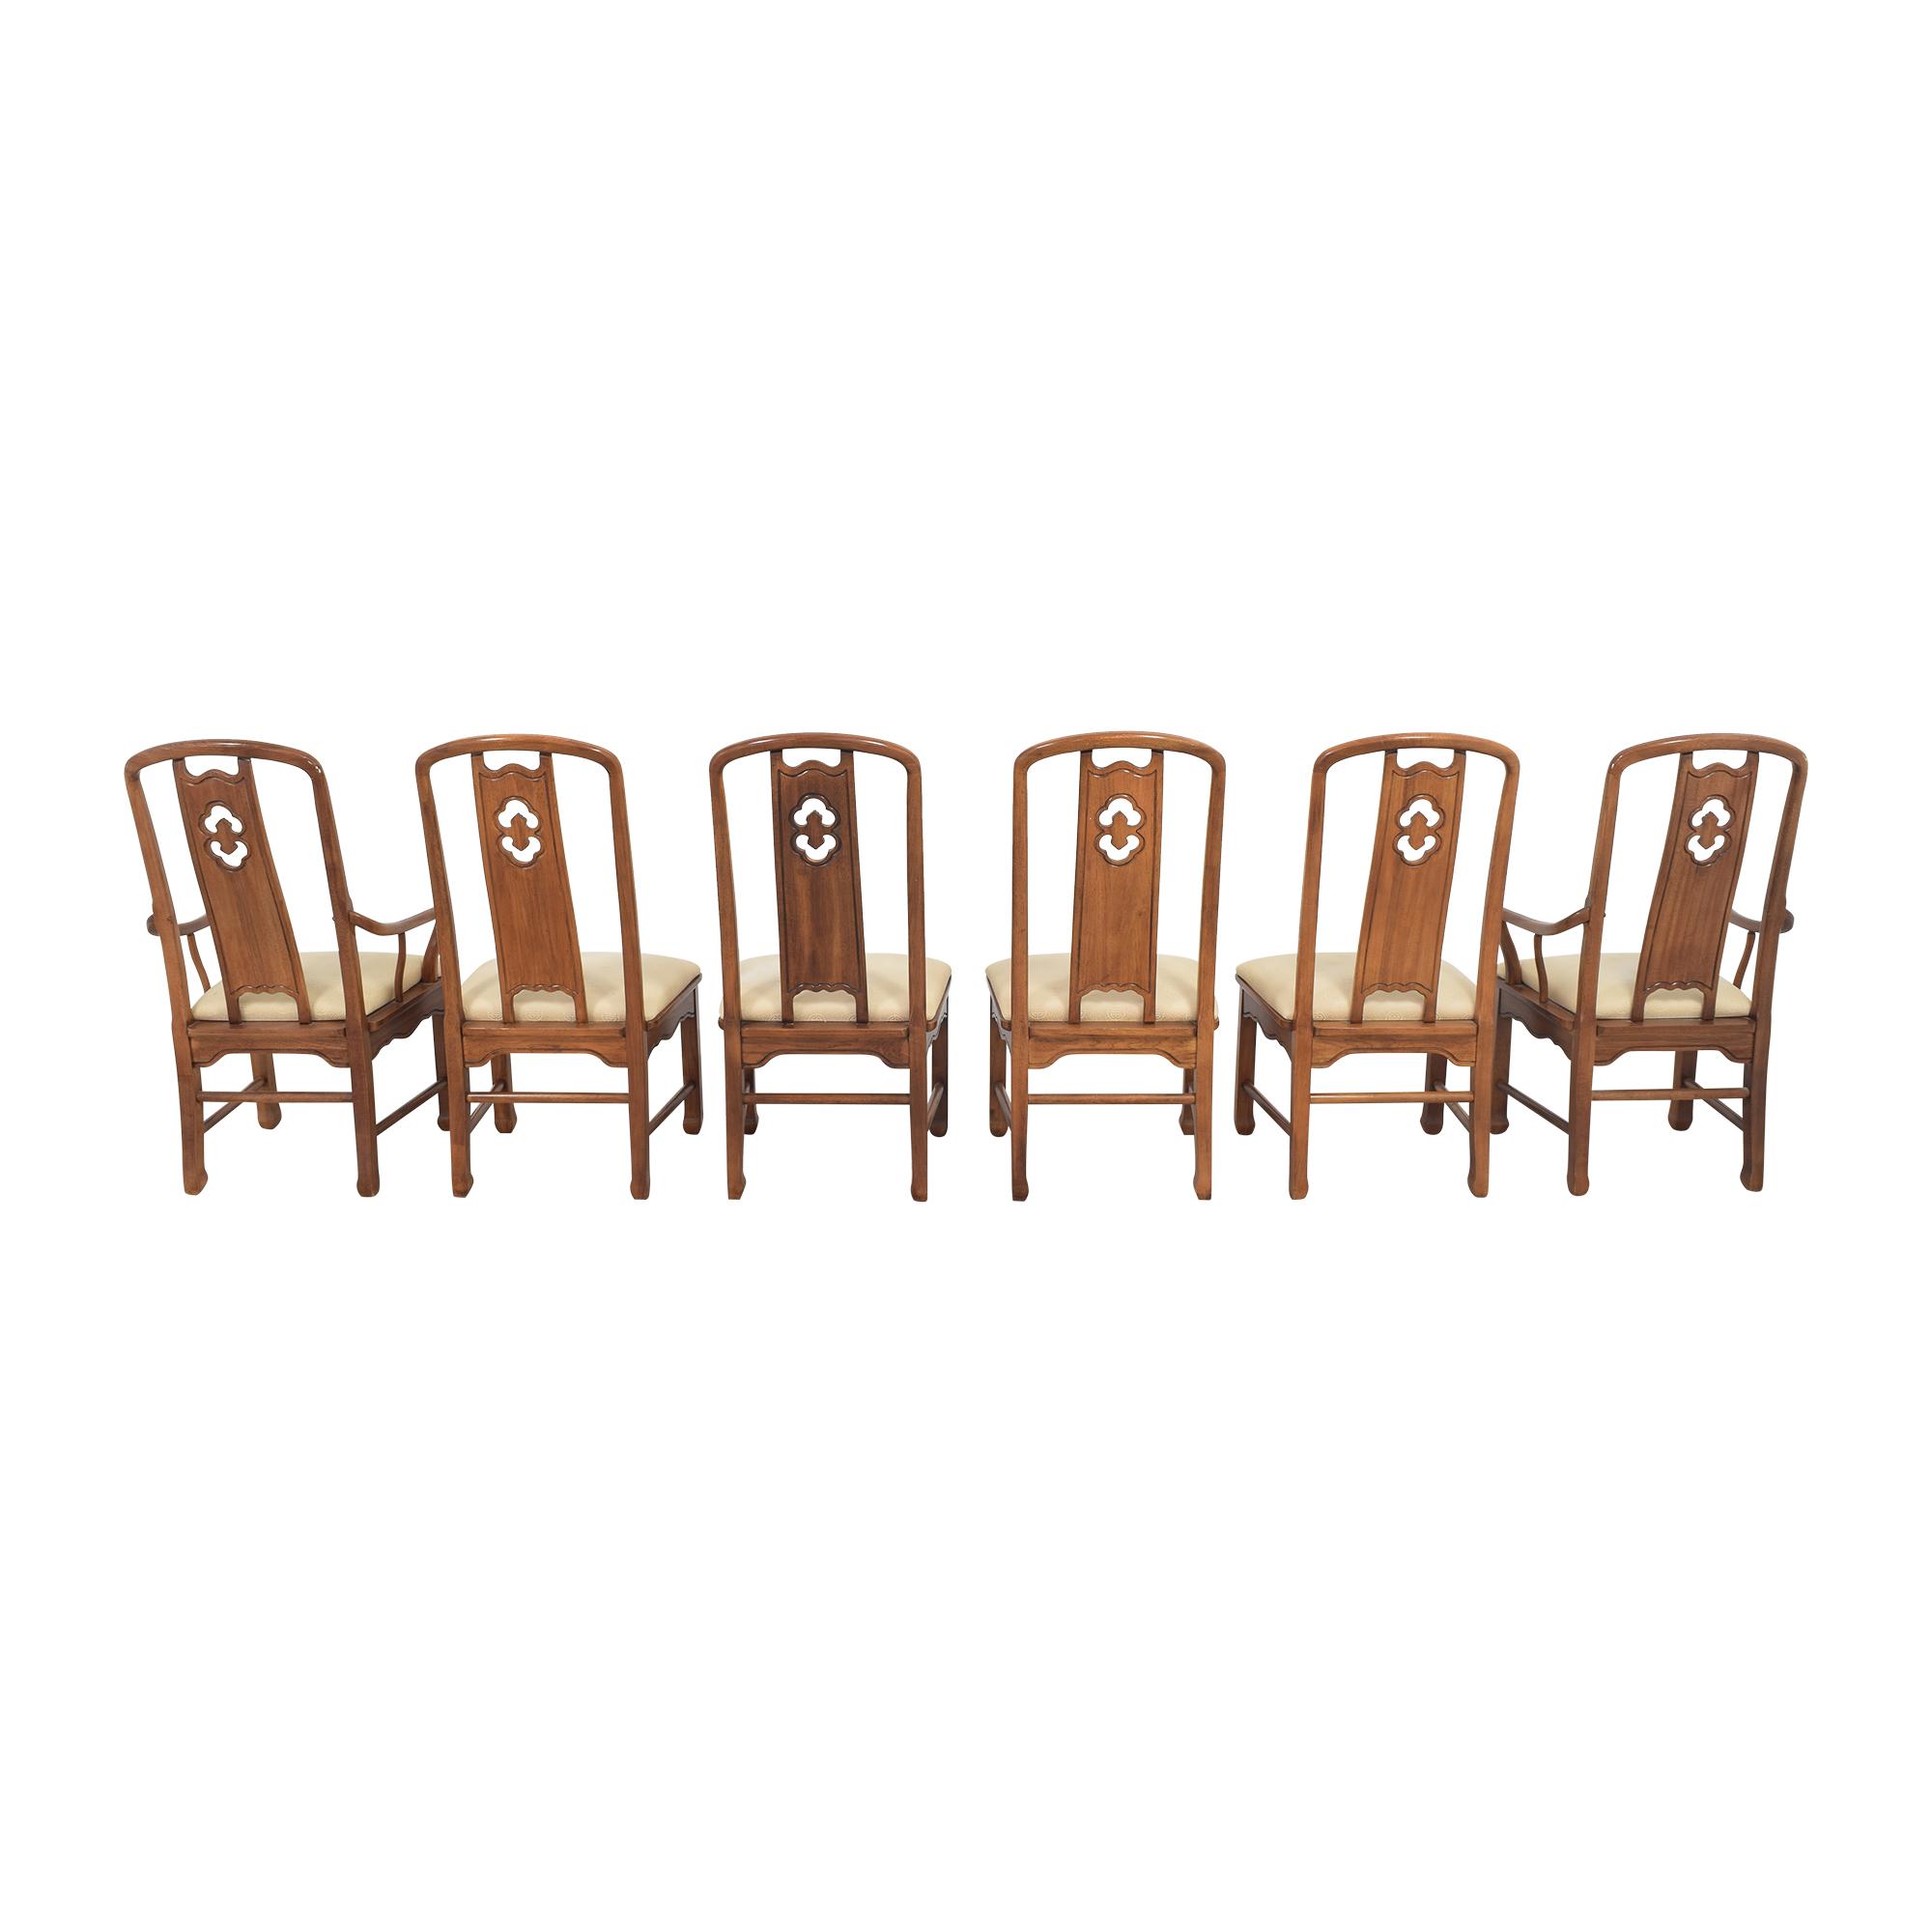 Thomasville Thomasville Dining Chairs used